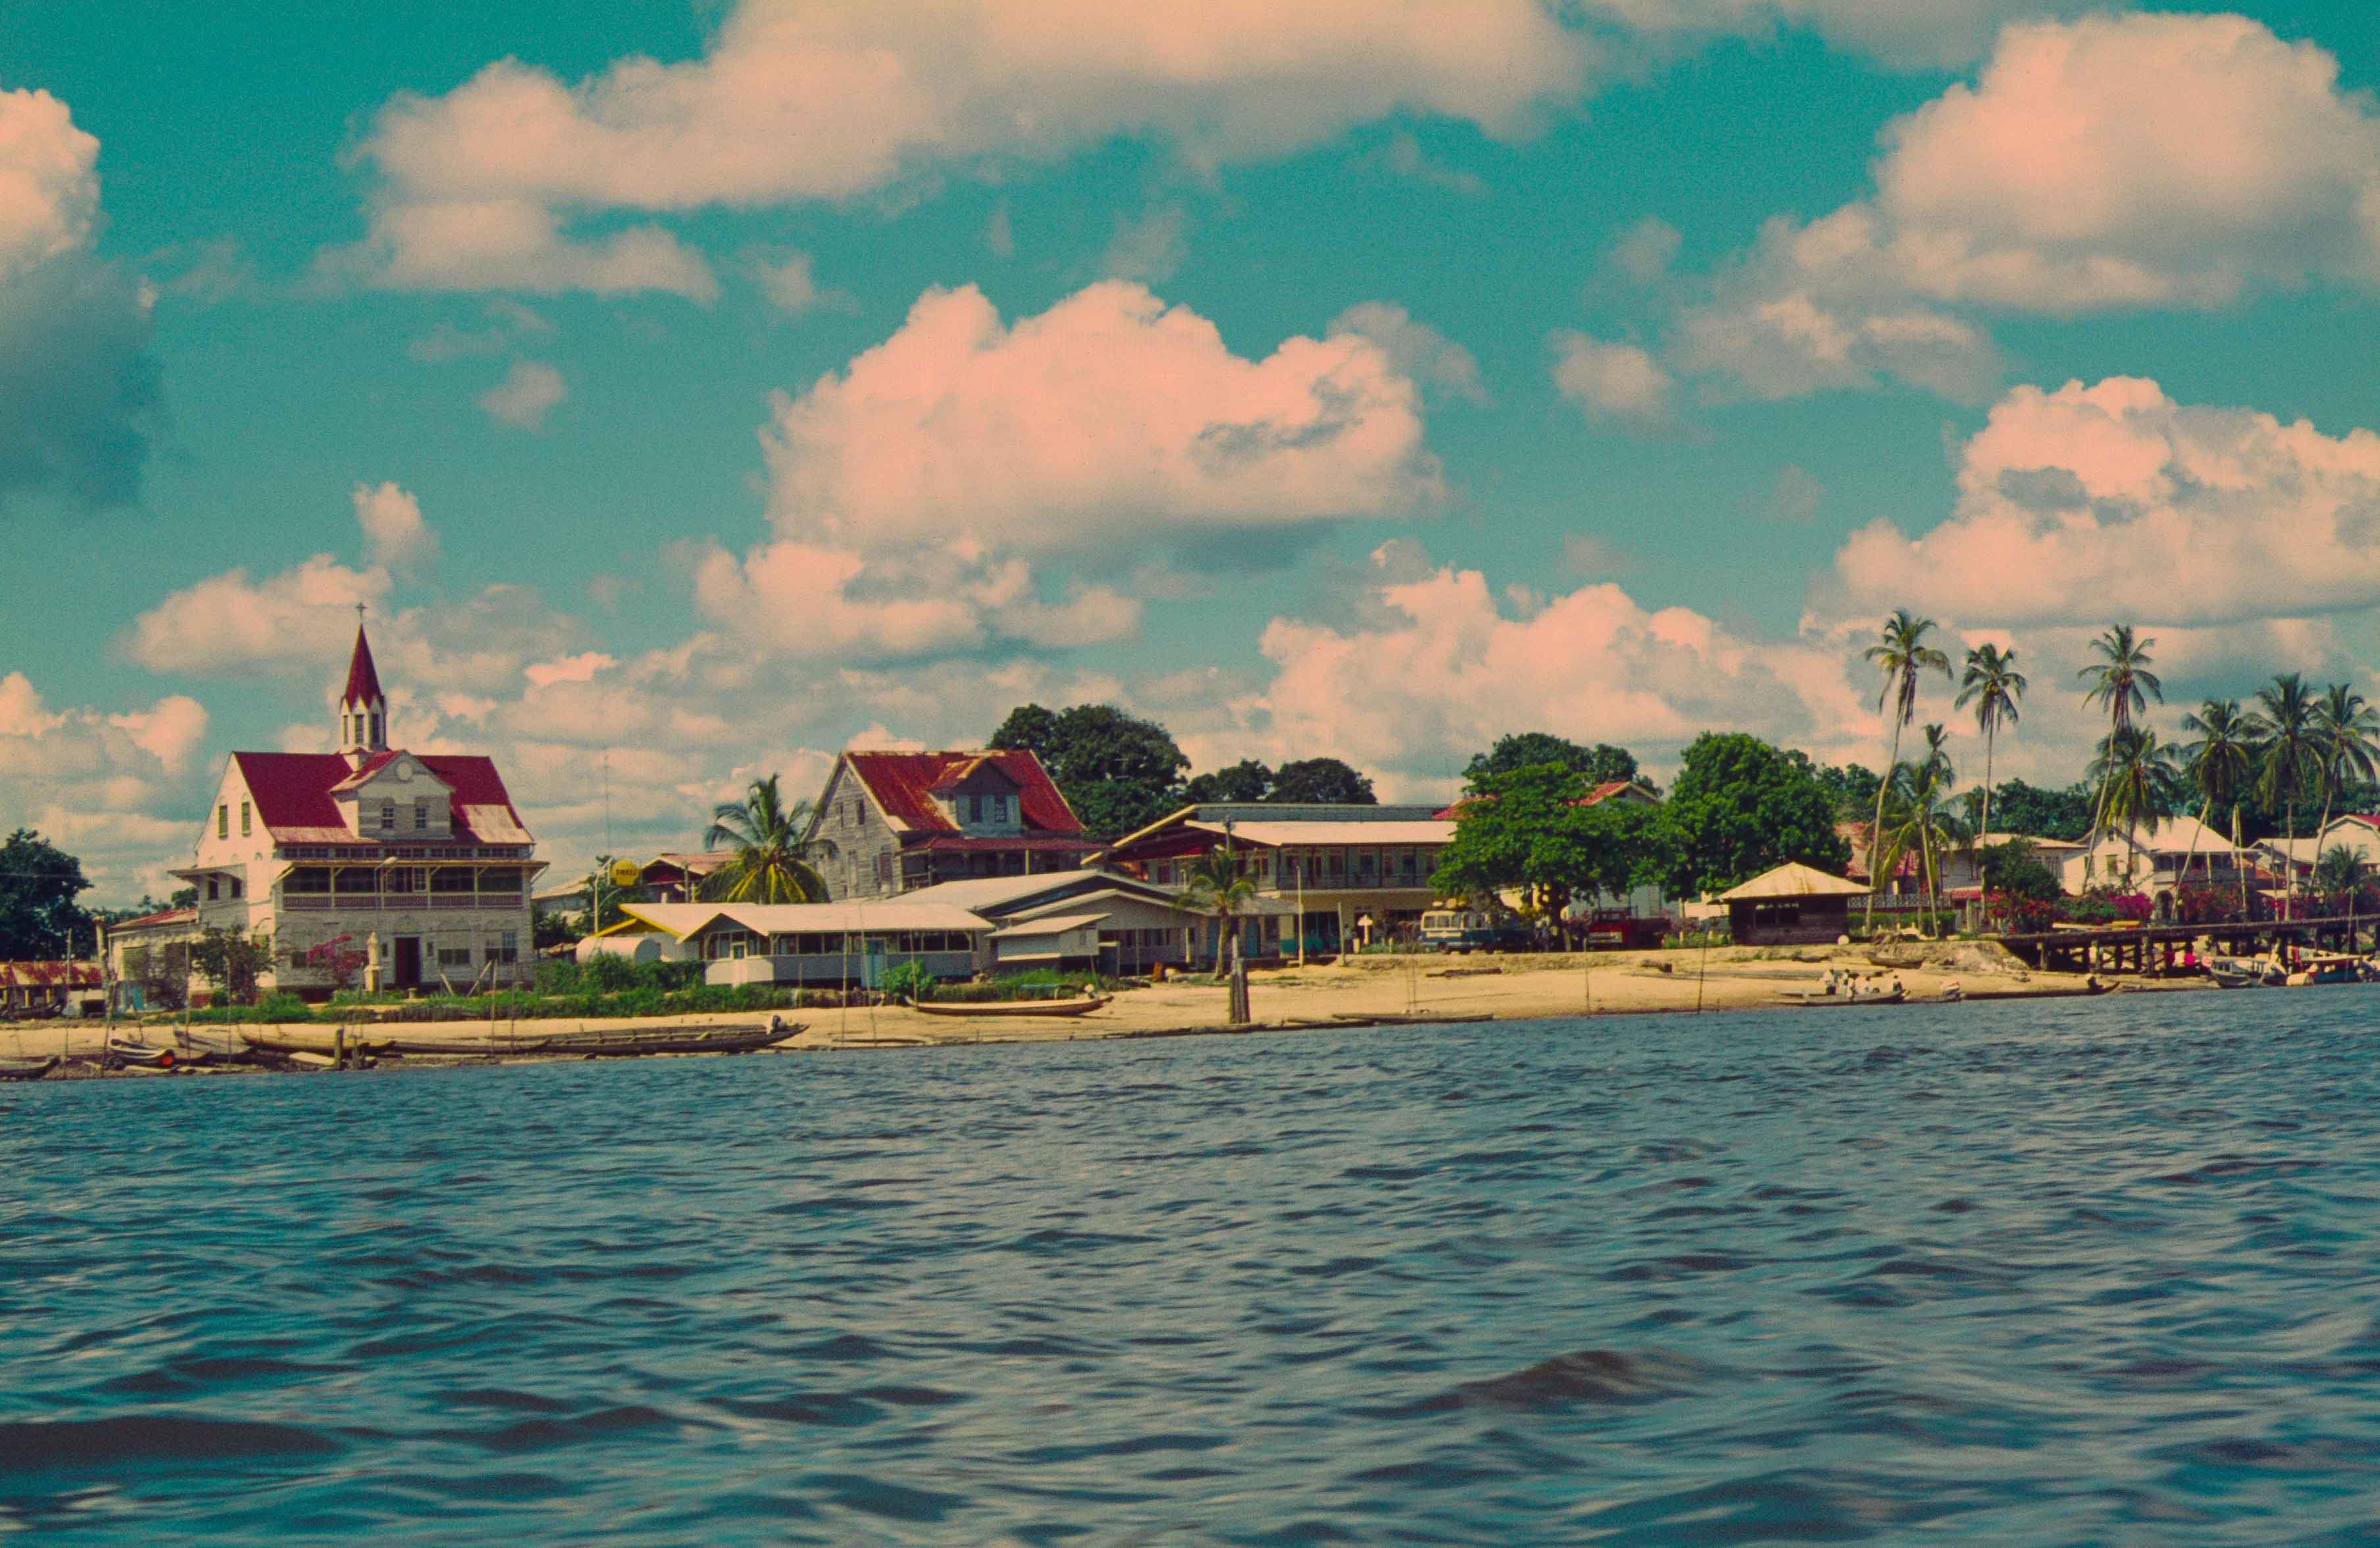 426. Suriname